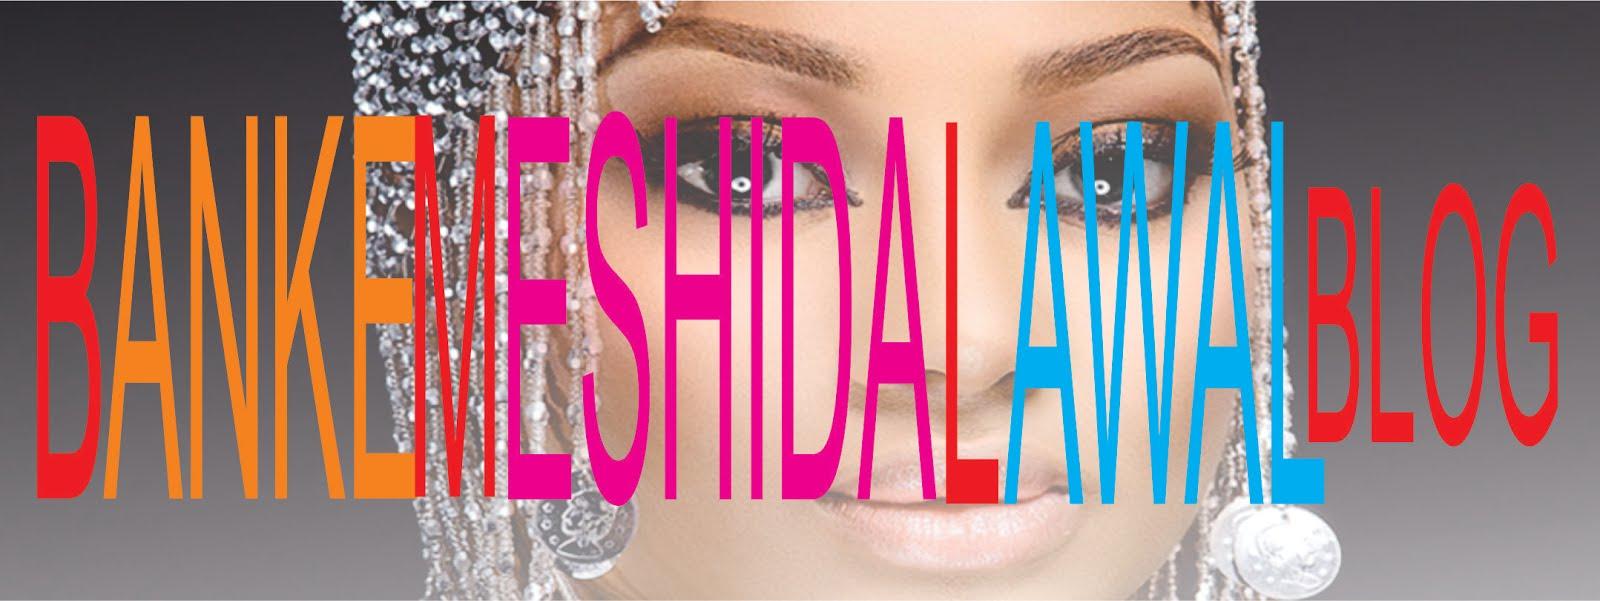 Banke Meshida Lawal Blog